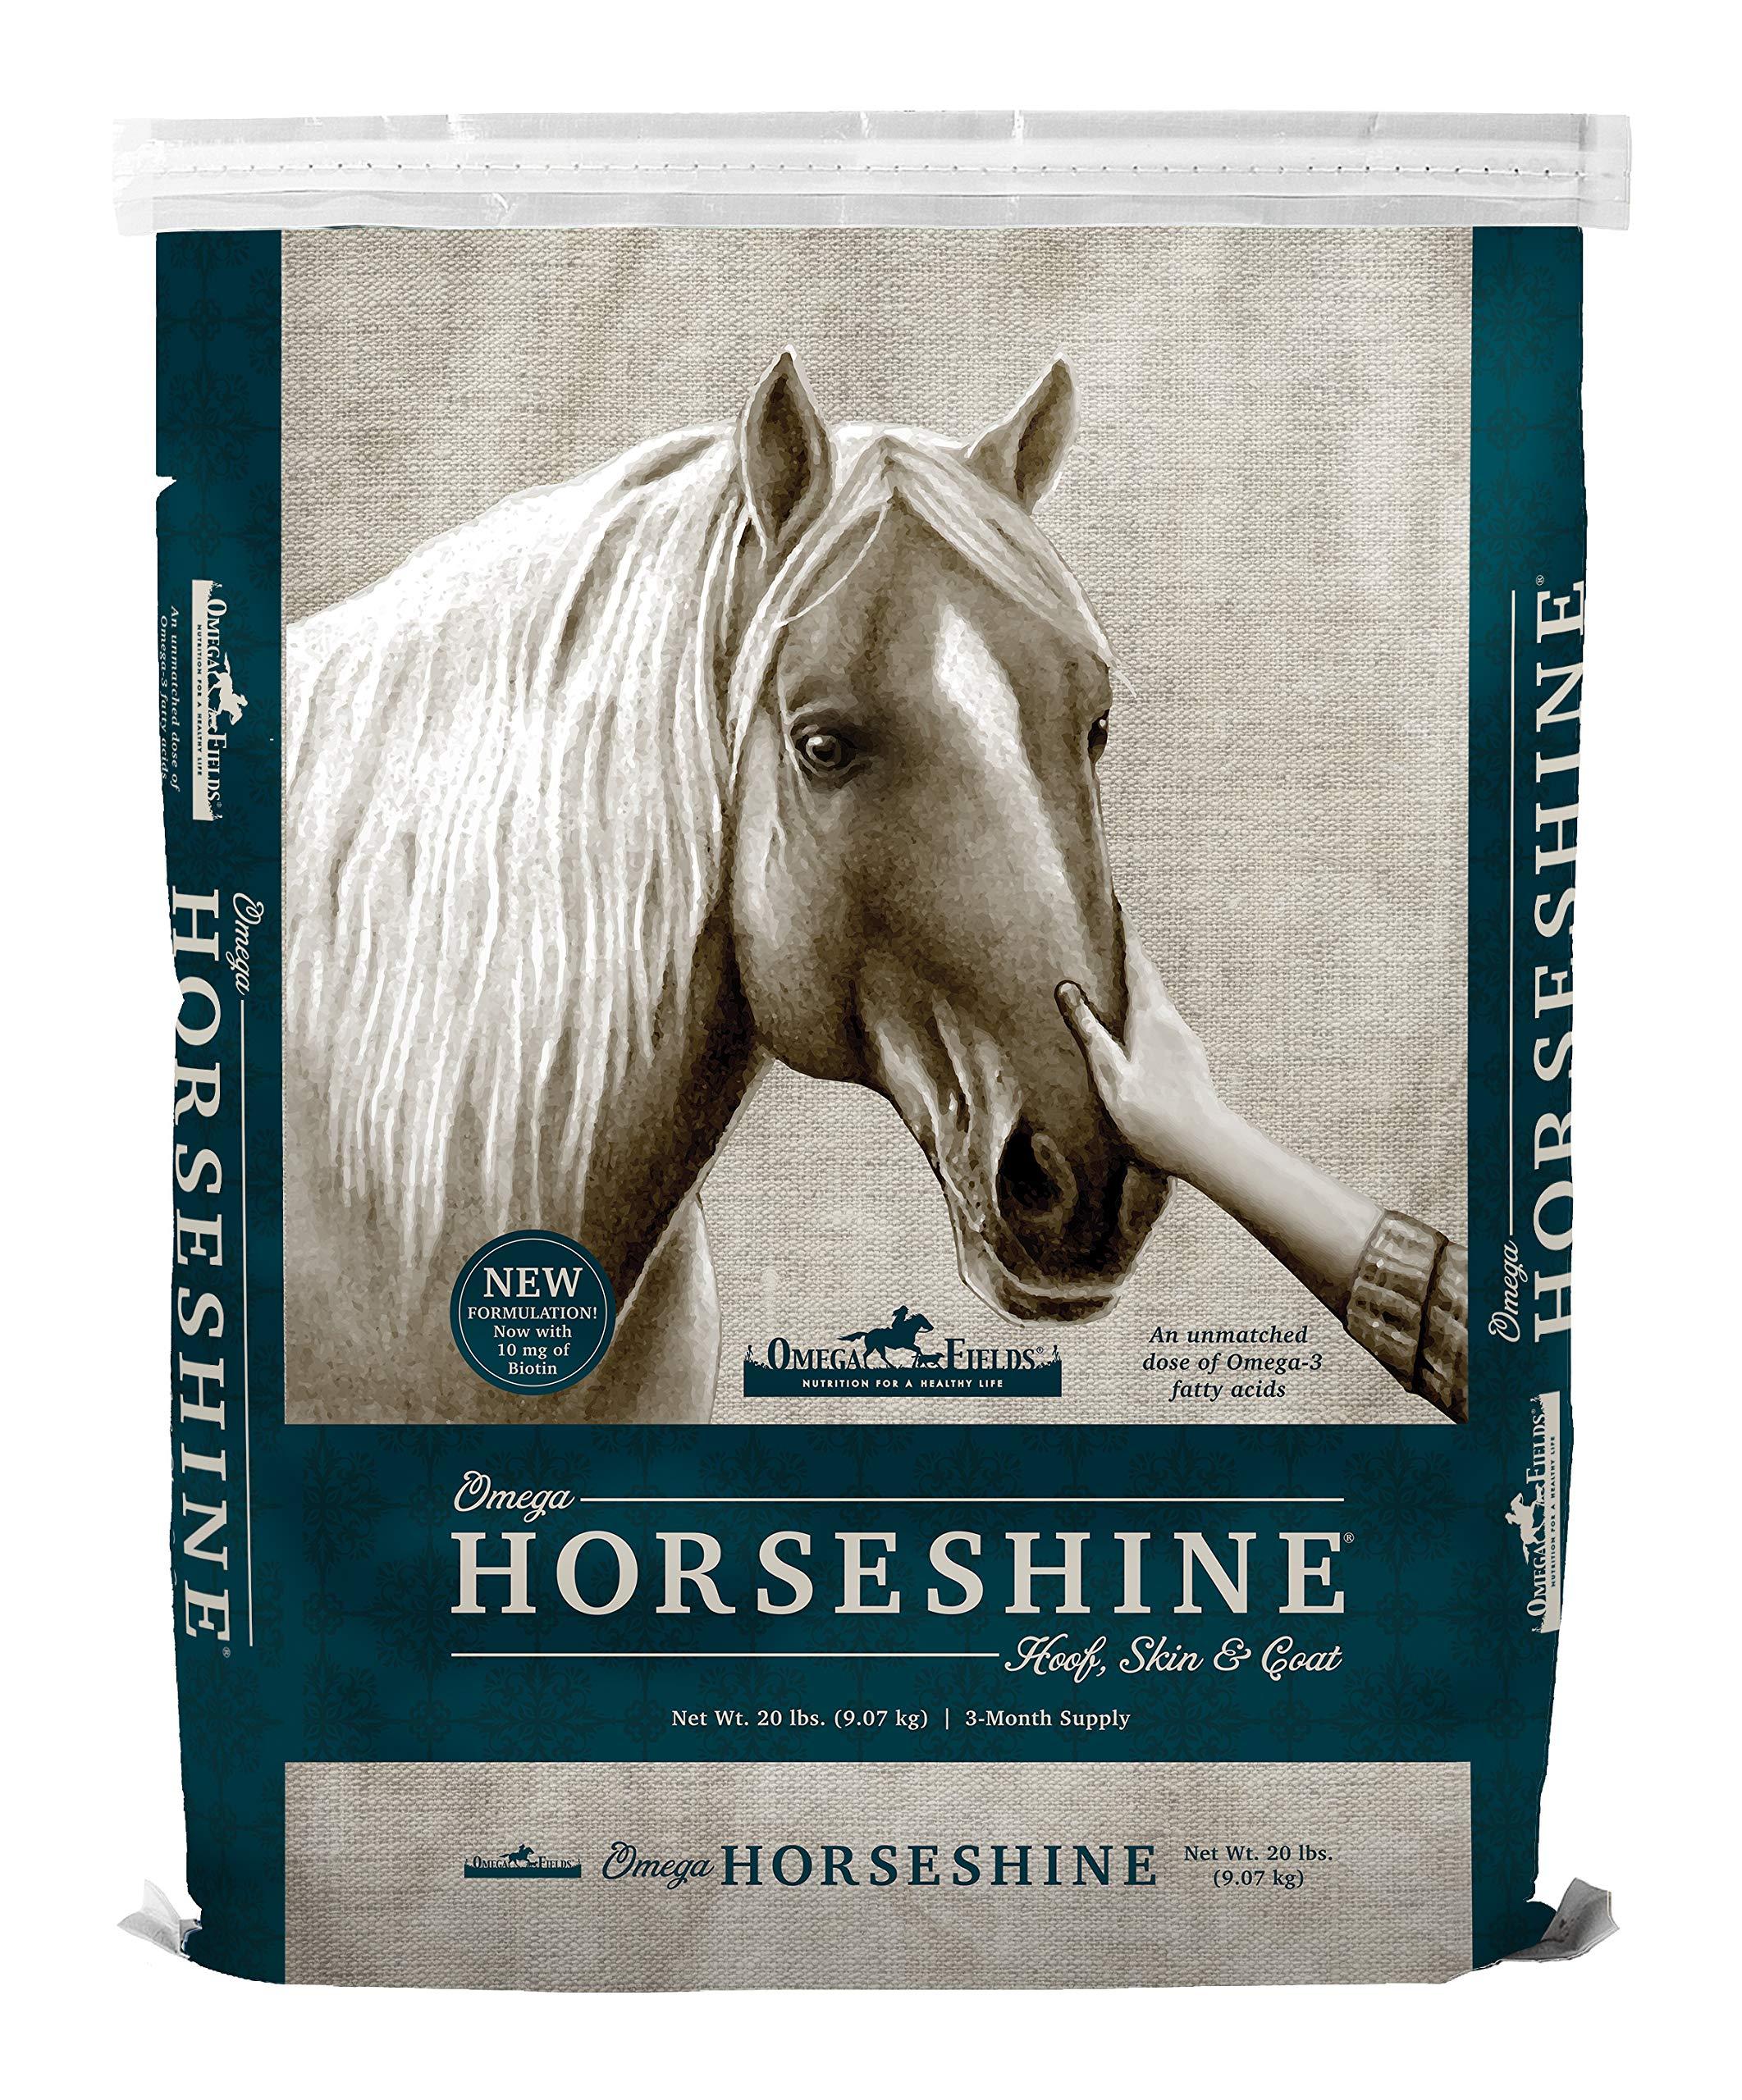 Omega Horseshine The Omega 3 Supplement, Helps Maintain a Shiny Healthy Coat, 20 lb by Omega Horseshine